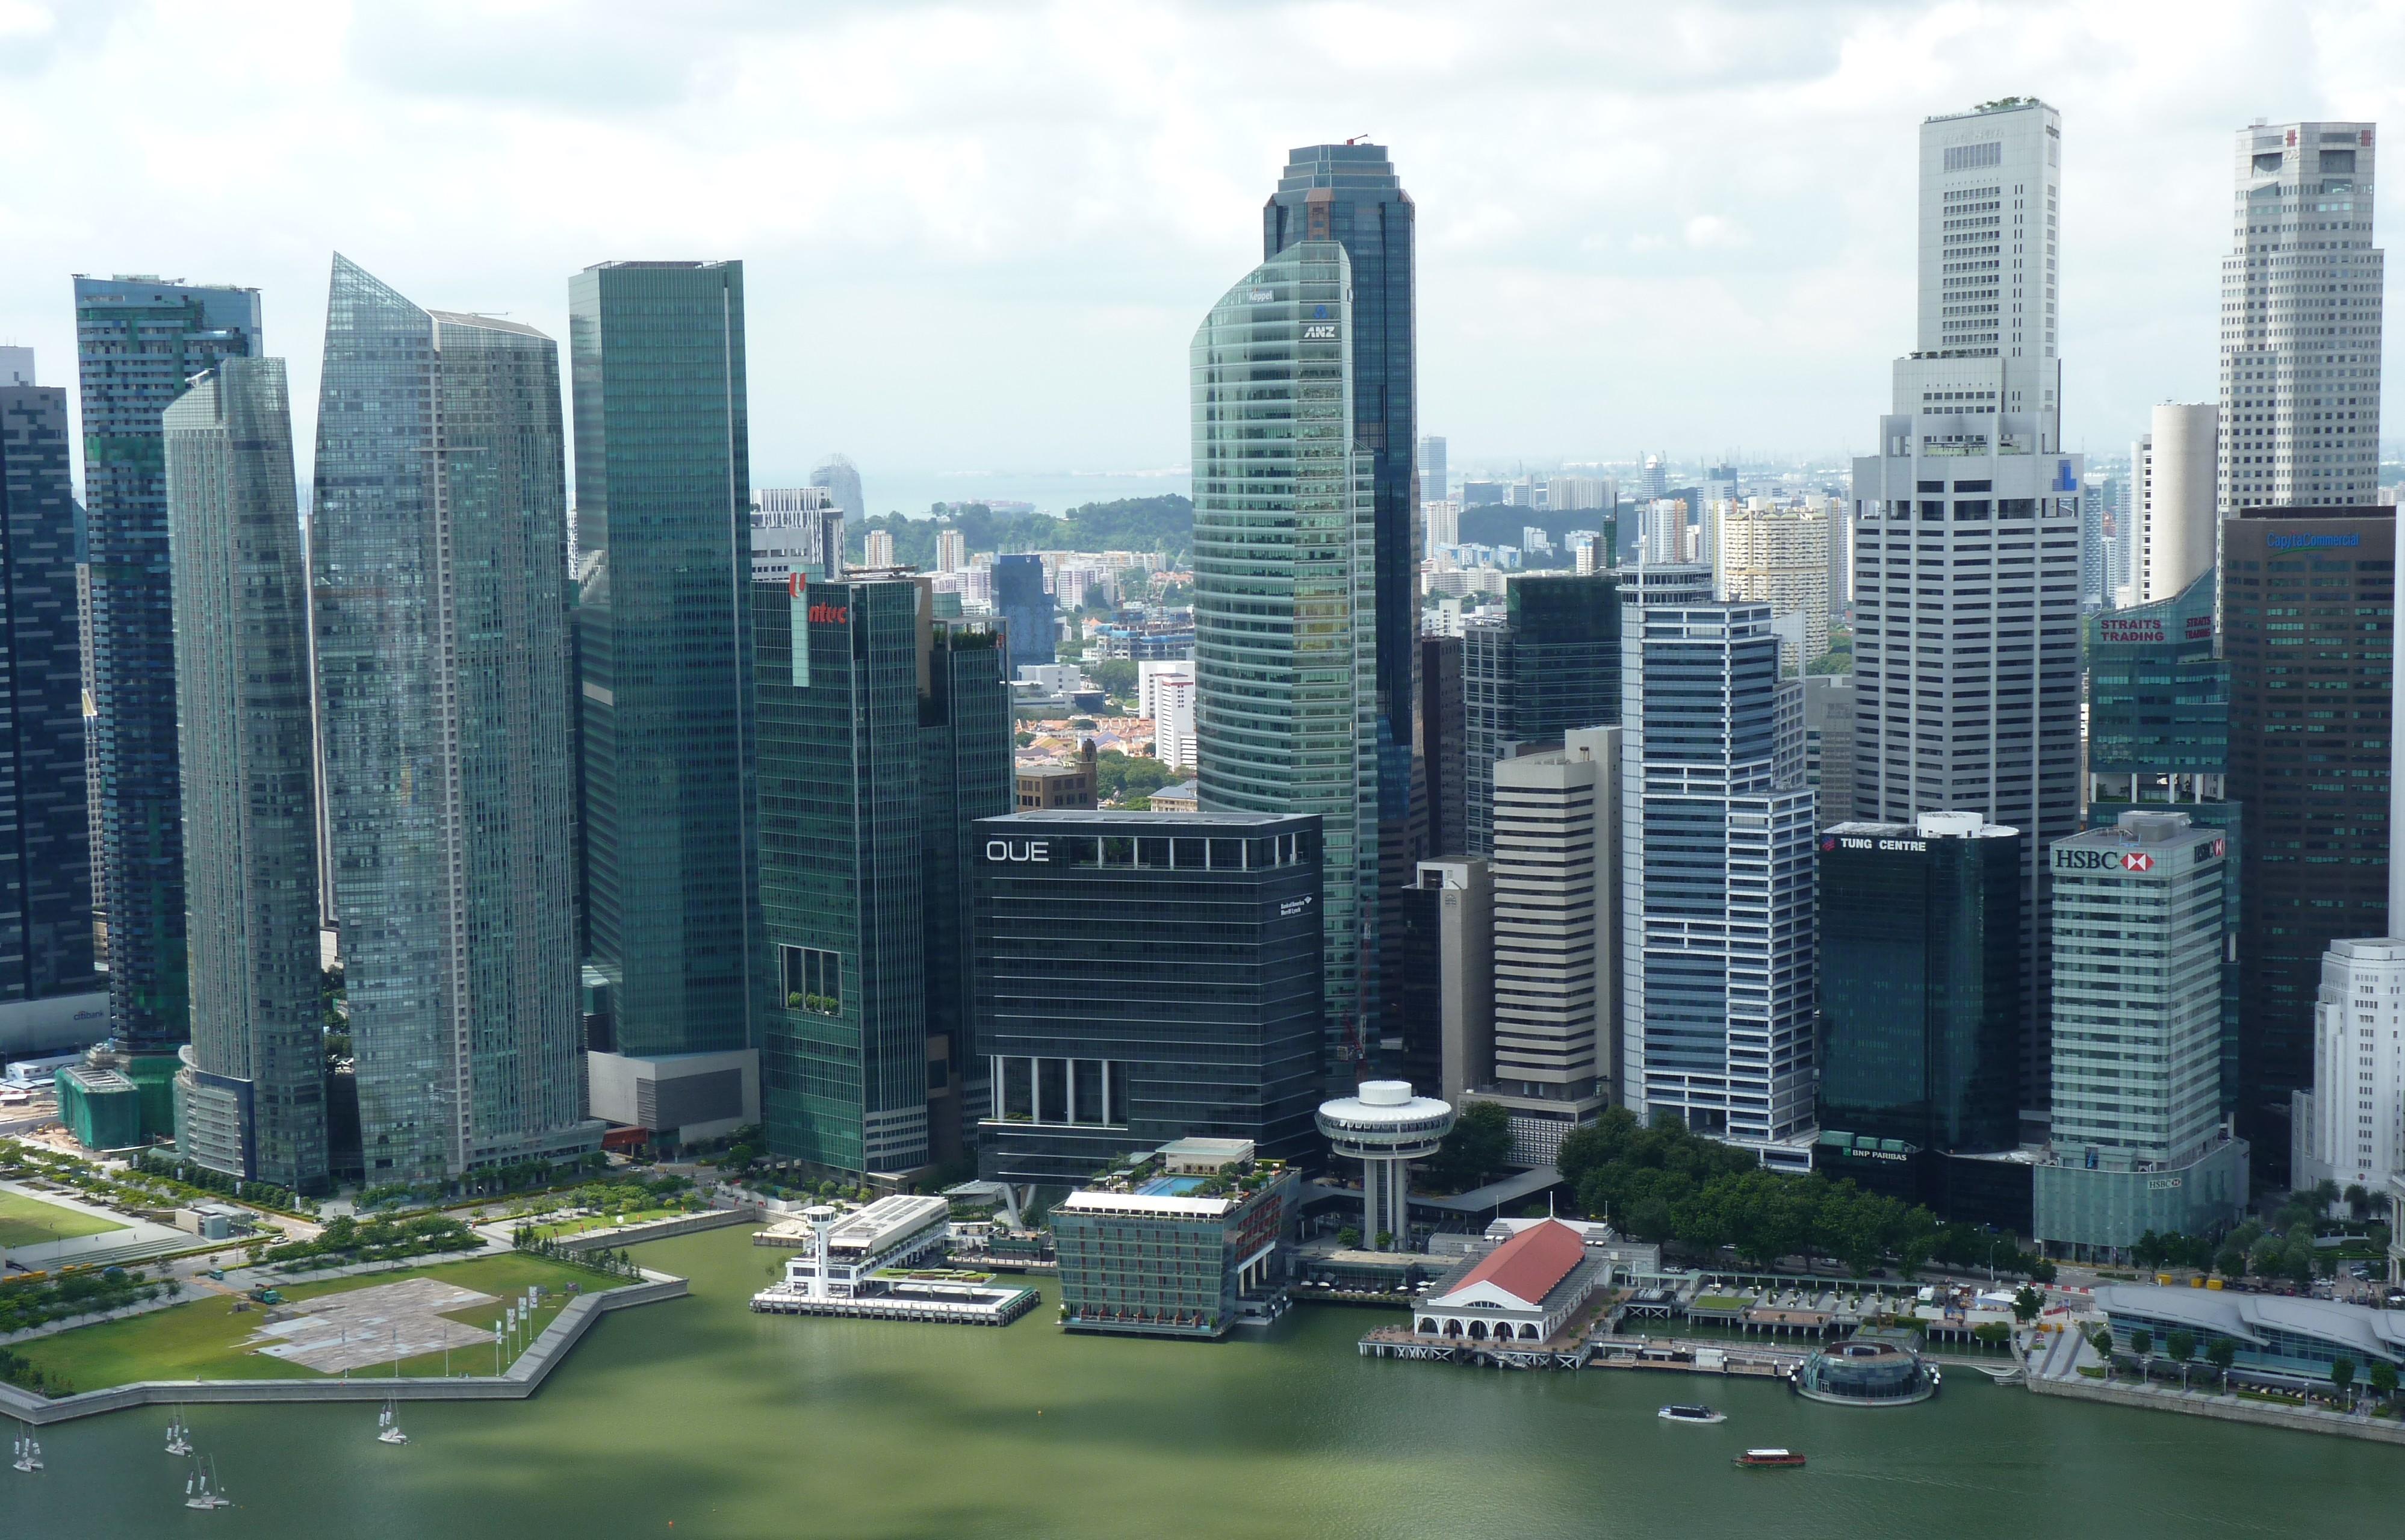 Úti célok 2015-re: Szingapúr